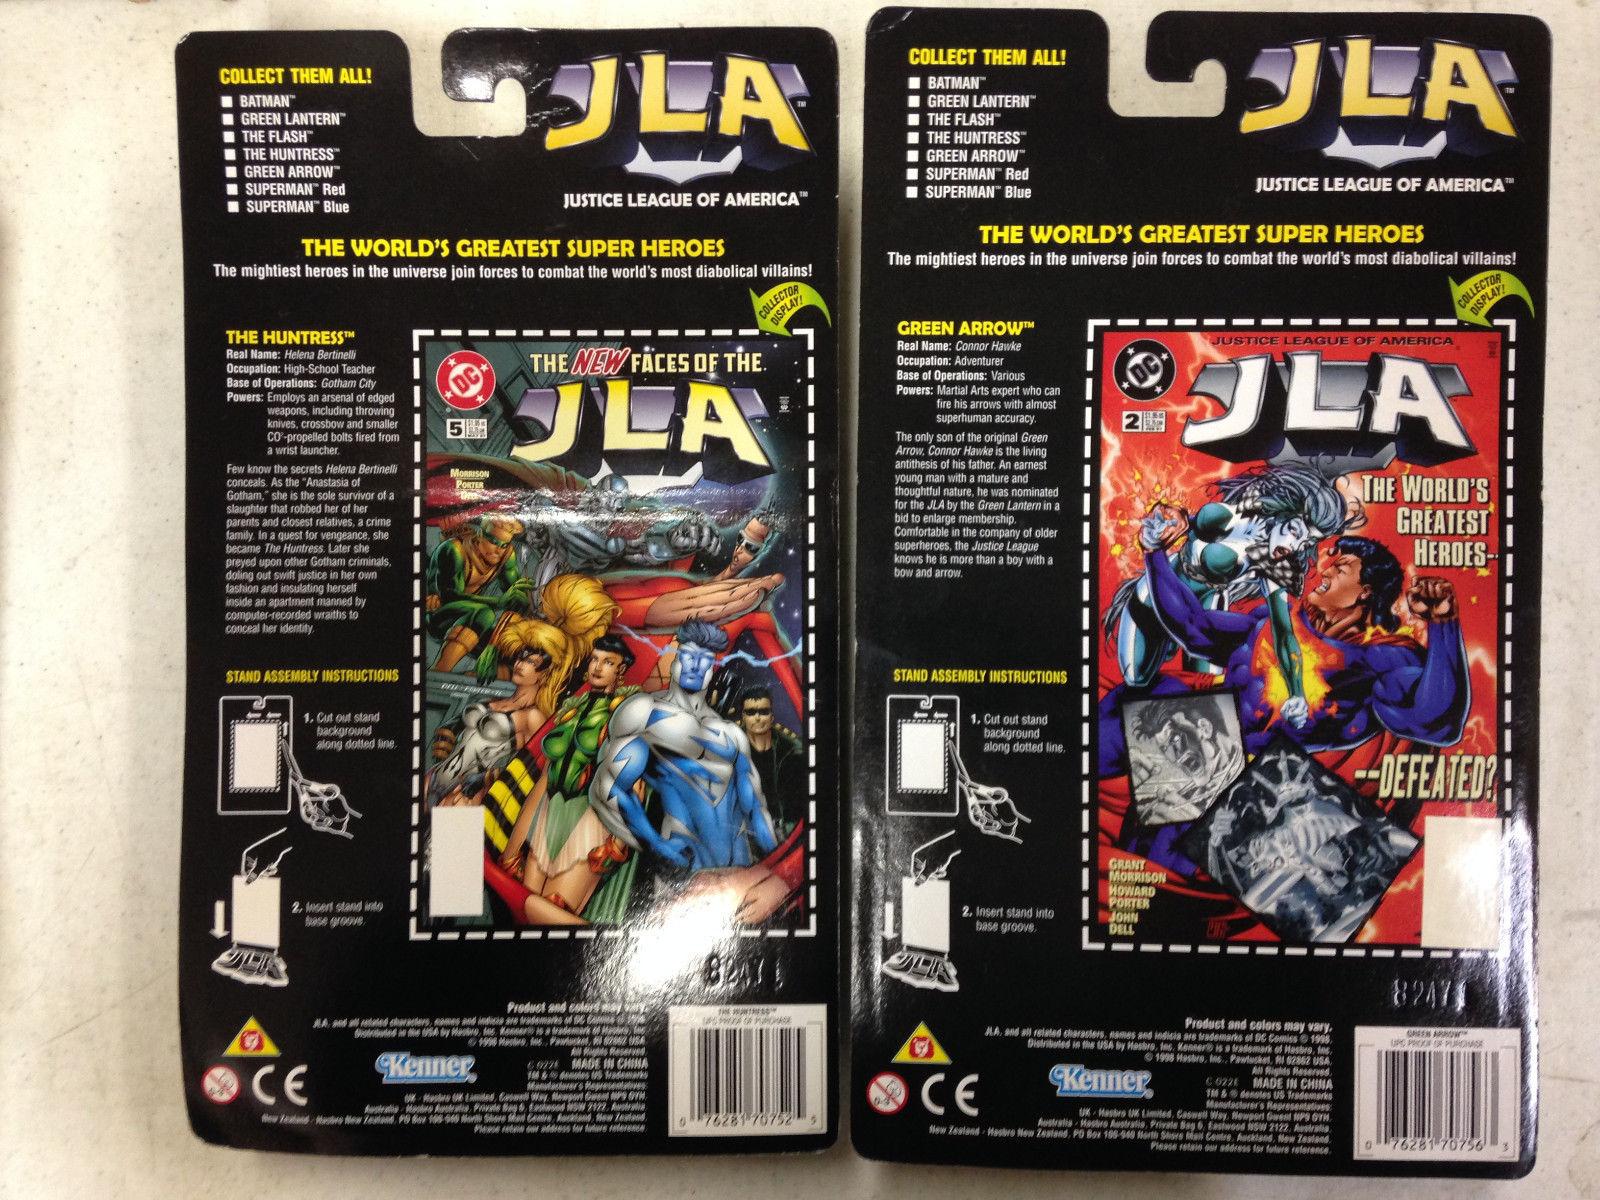 1998-hasbro-jla-justice-league-of-america-series-_57.jpg